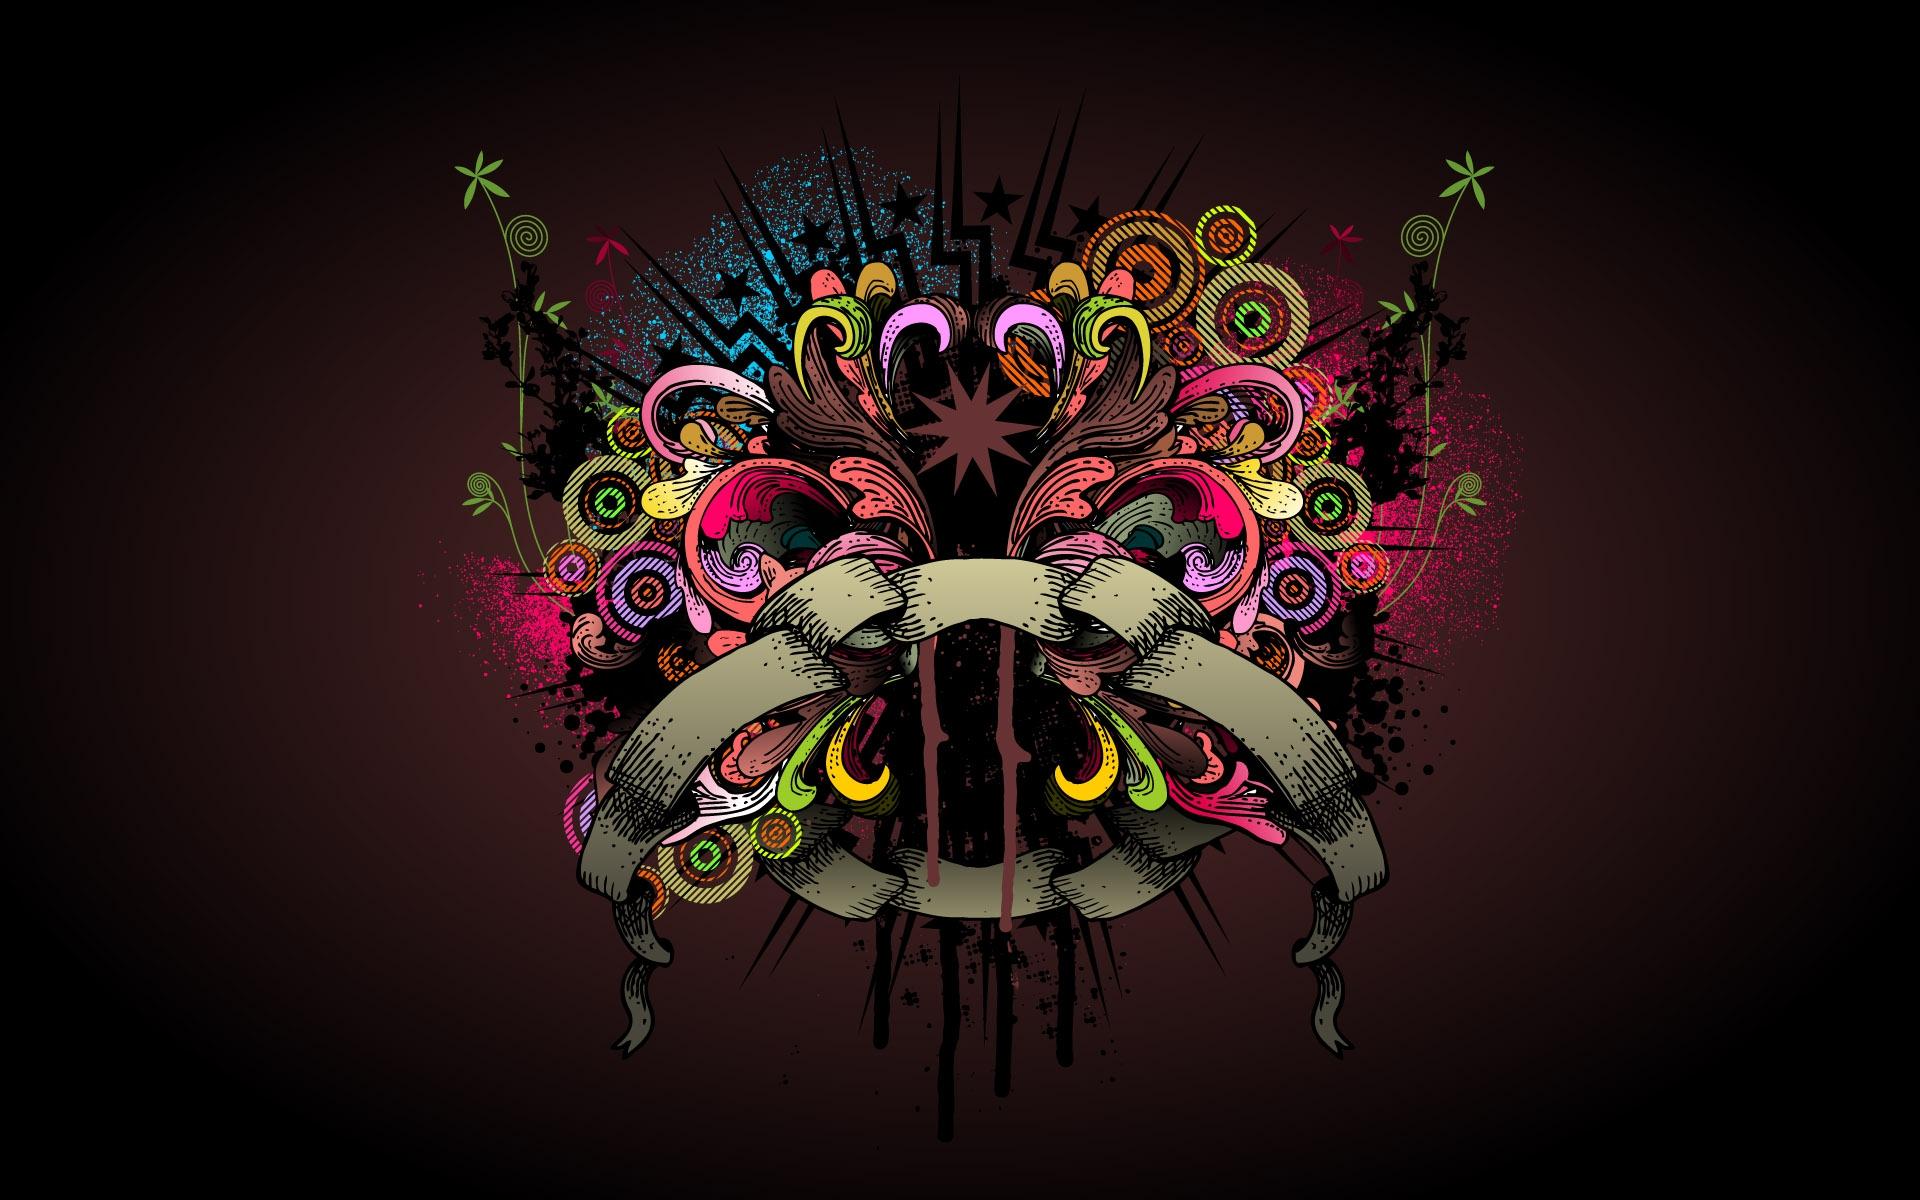 wallpaper : drawing, colorful, illustration, purple, symmetry